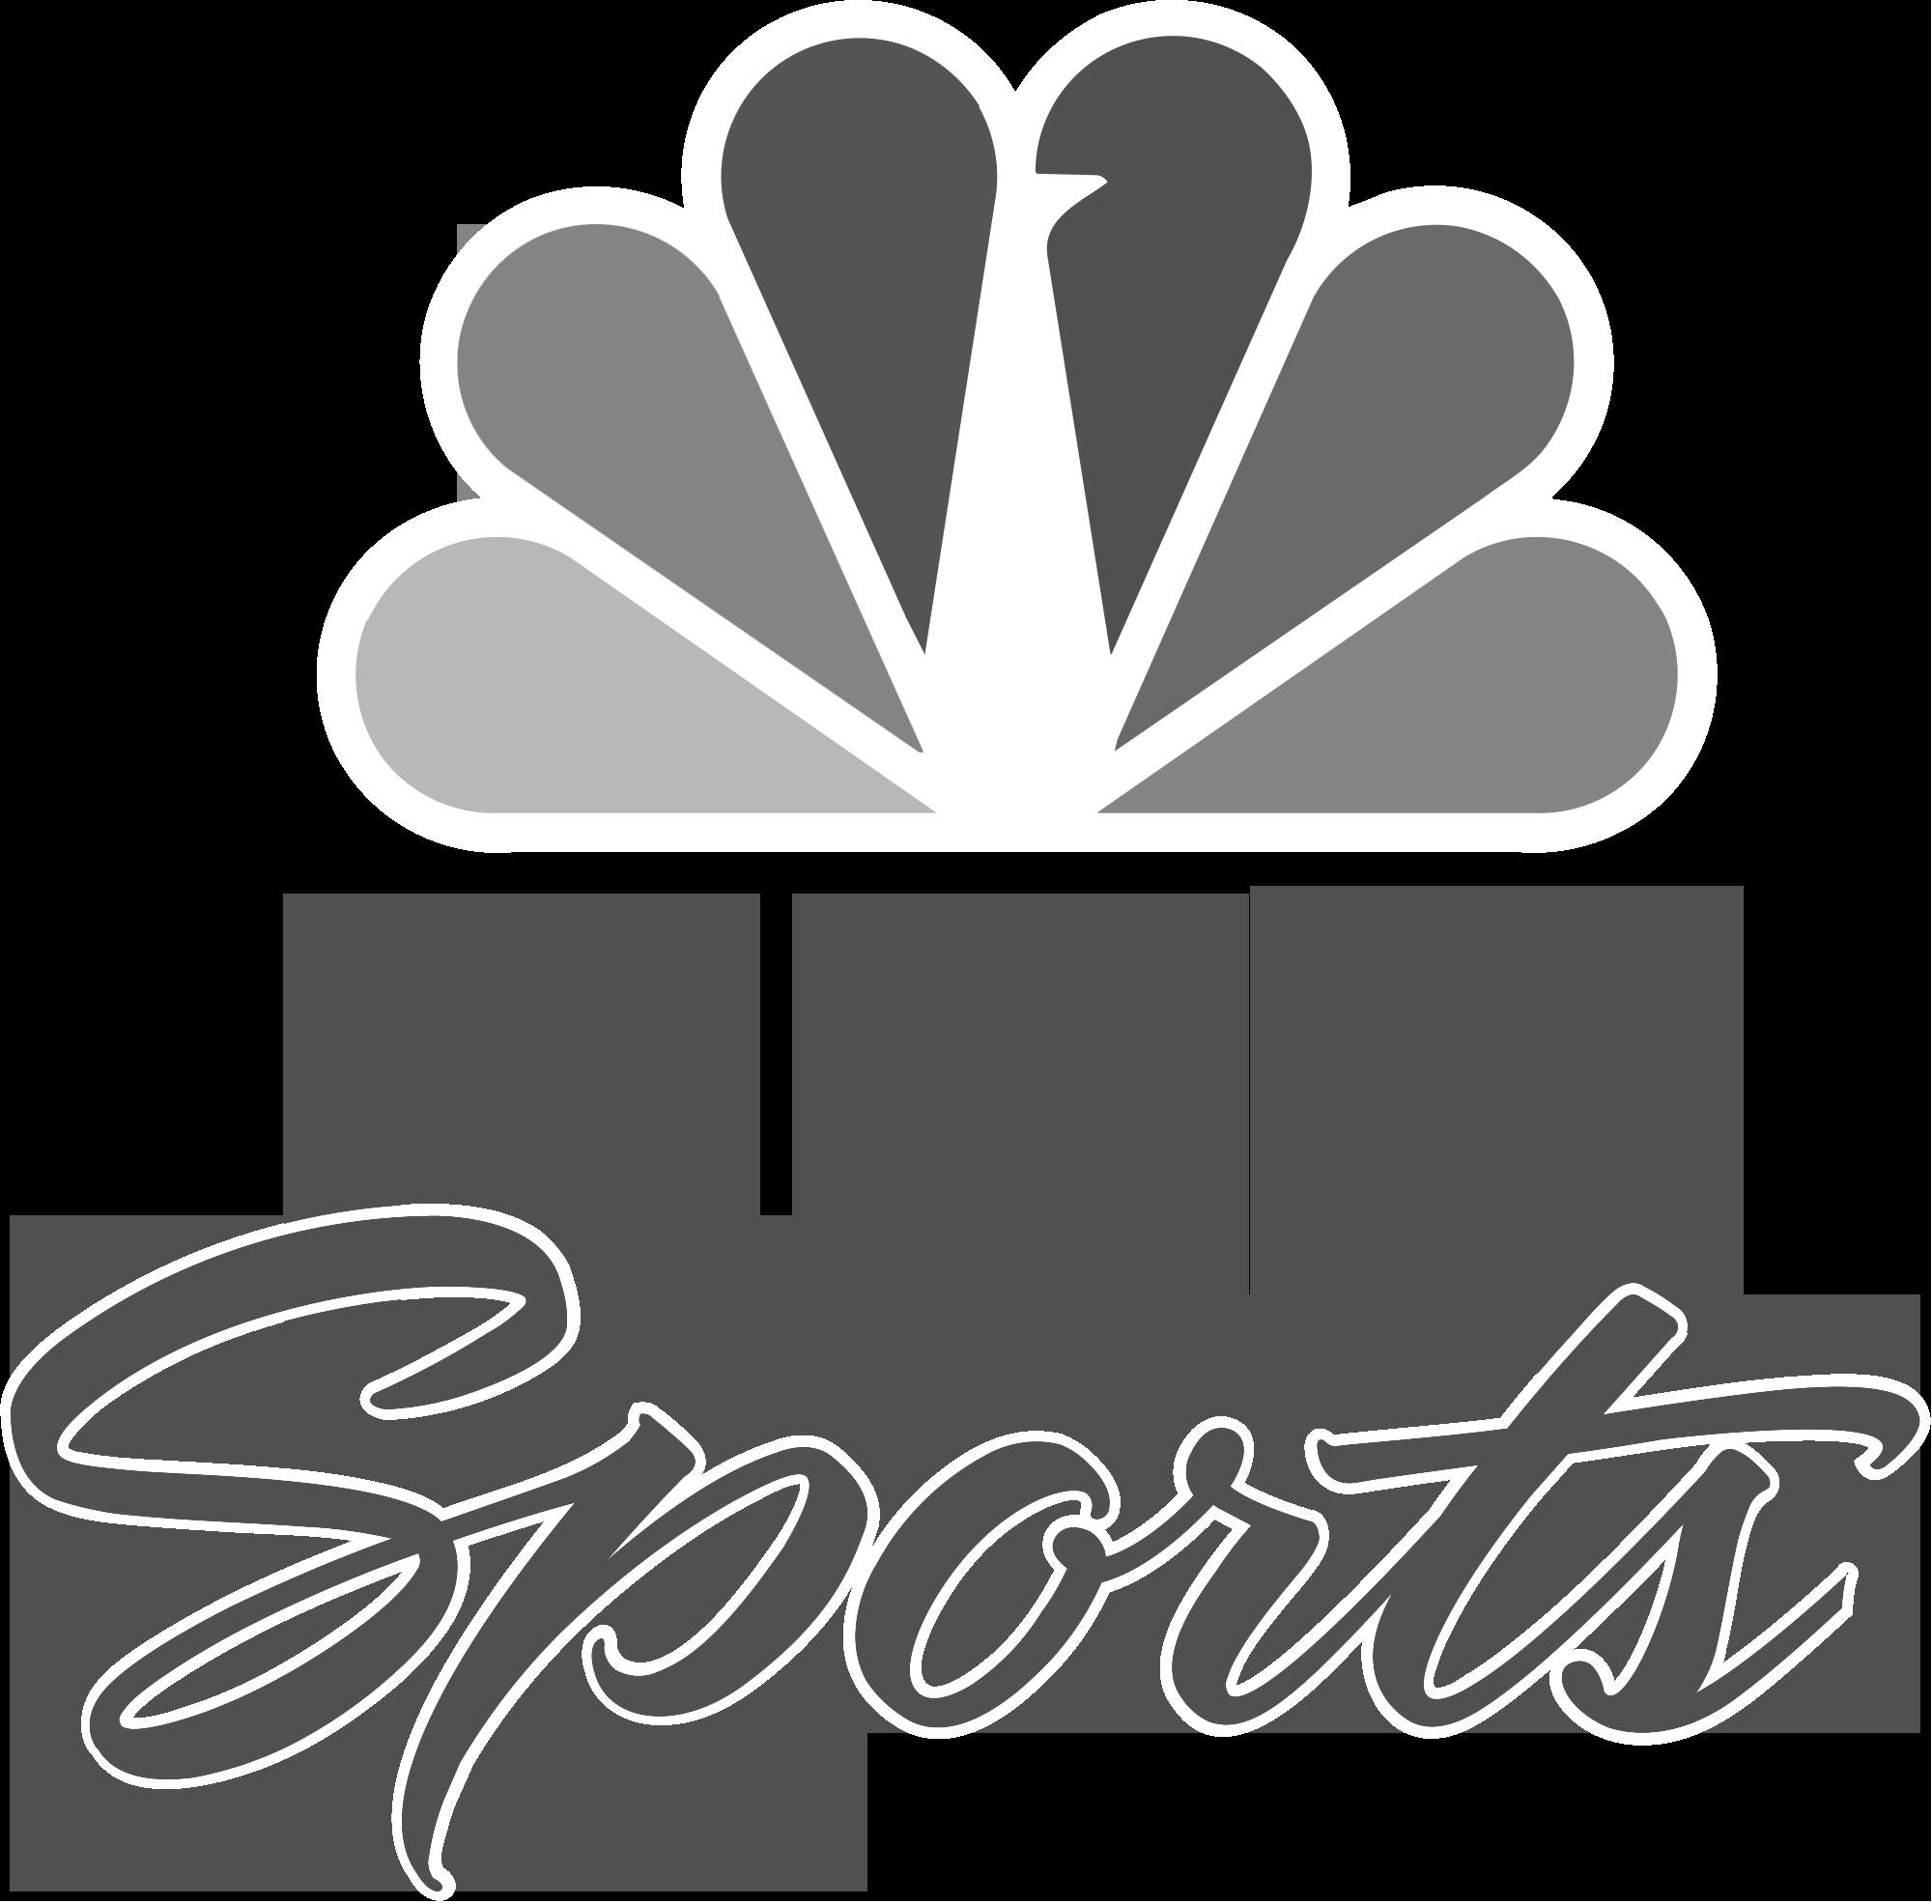 NBC Sports-chromosomes-music